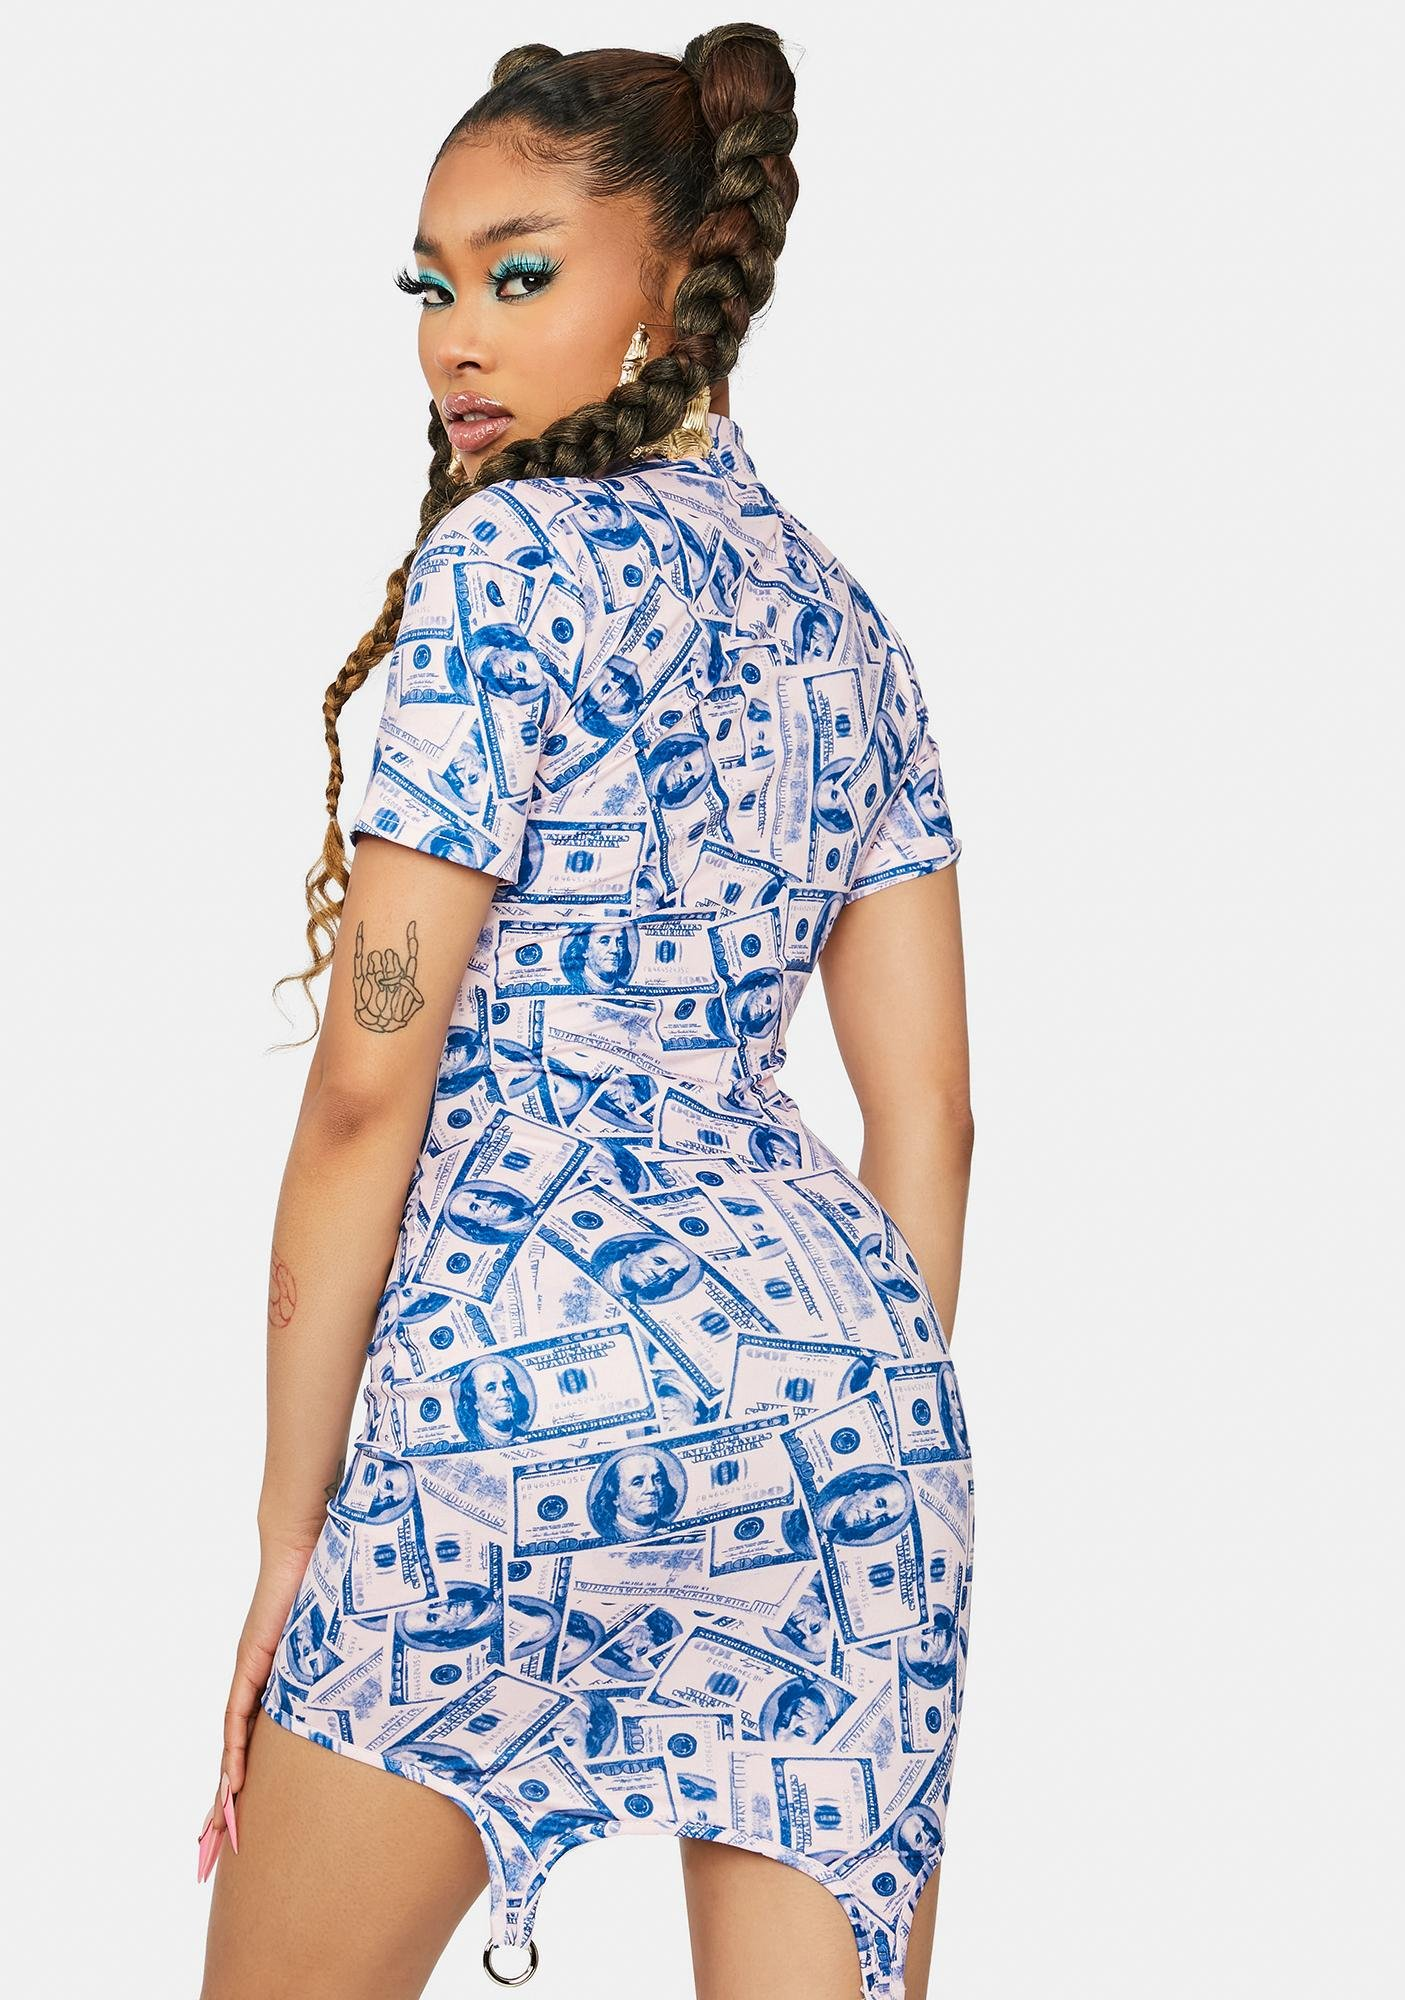 Sweet Big Spender Money Print Mini Dress